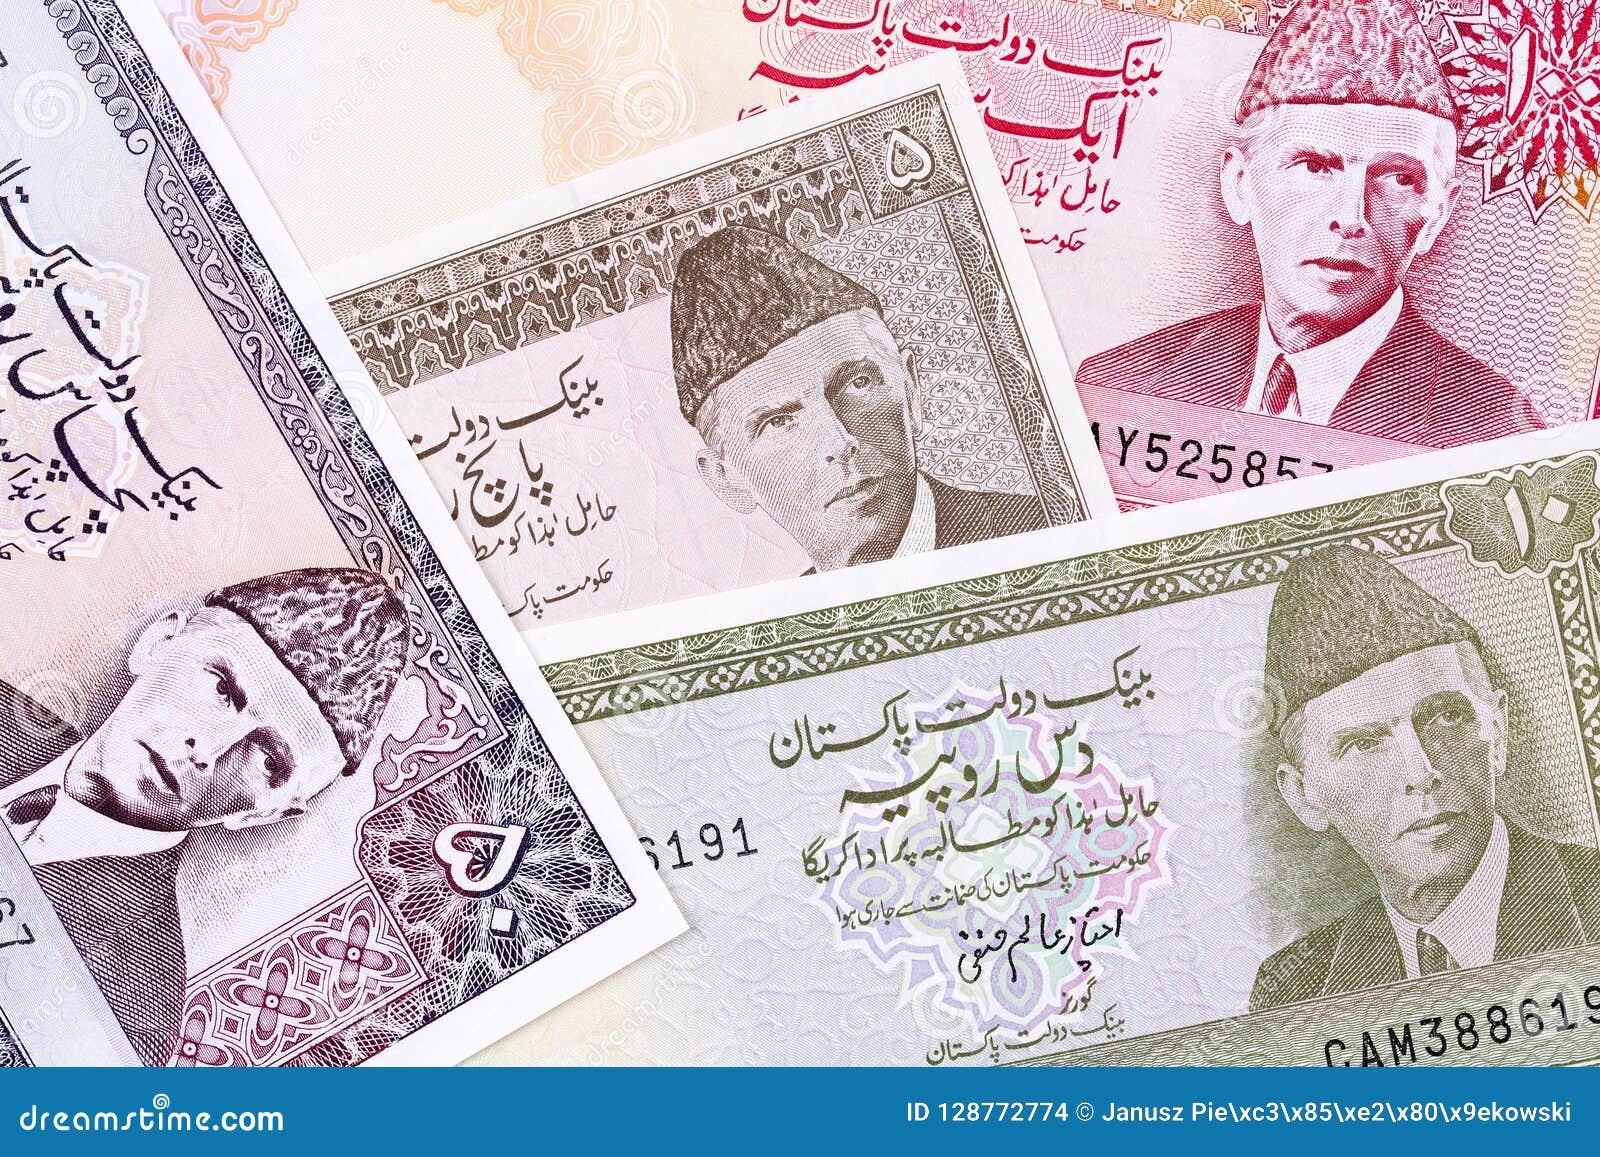 Old Pakistani money, a background